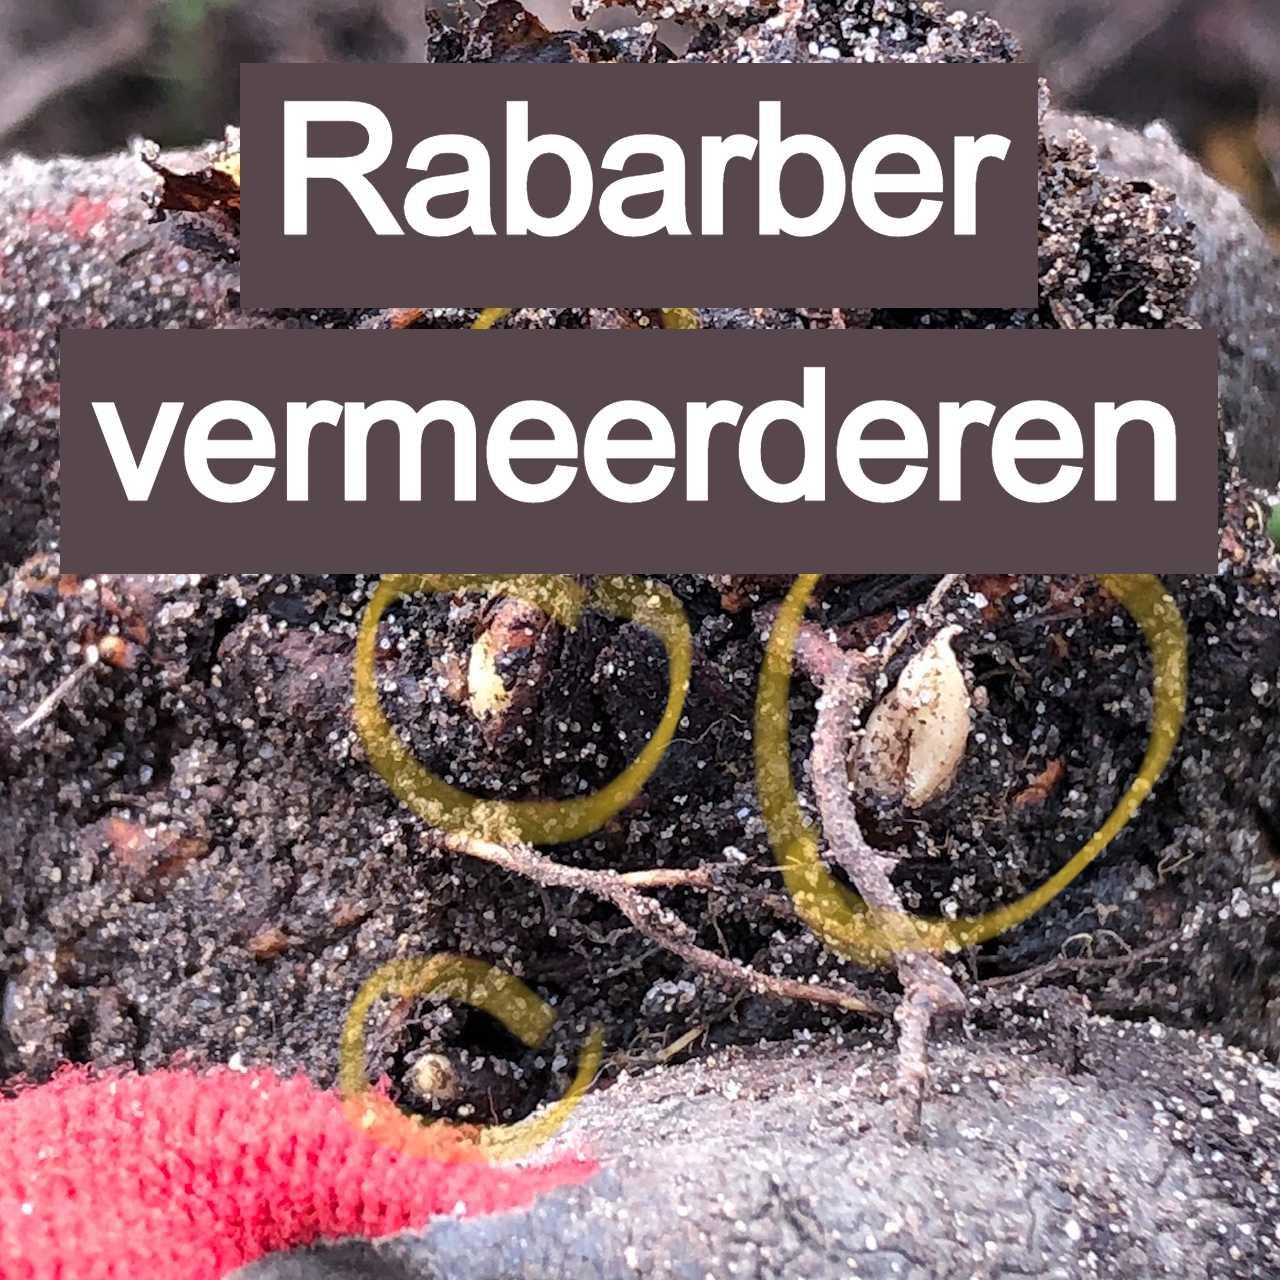 rarbarber vermeerderen moestuin najaar november